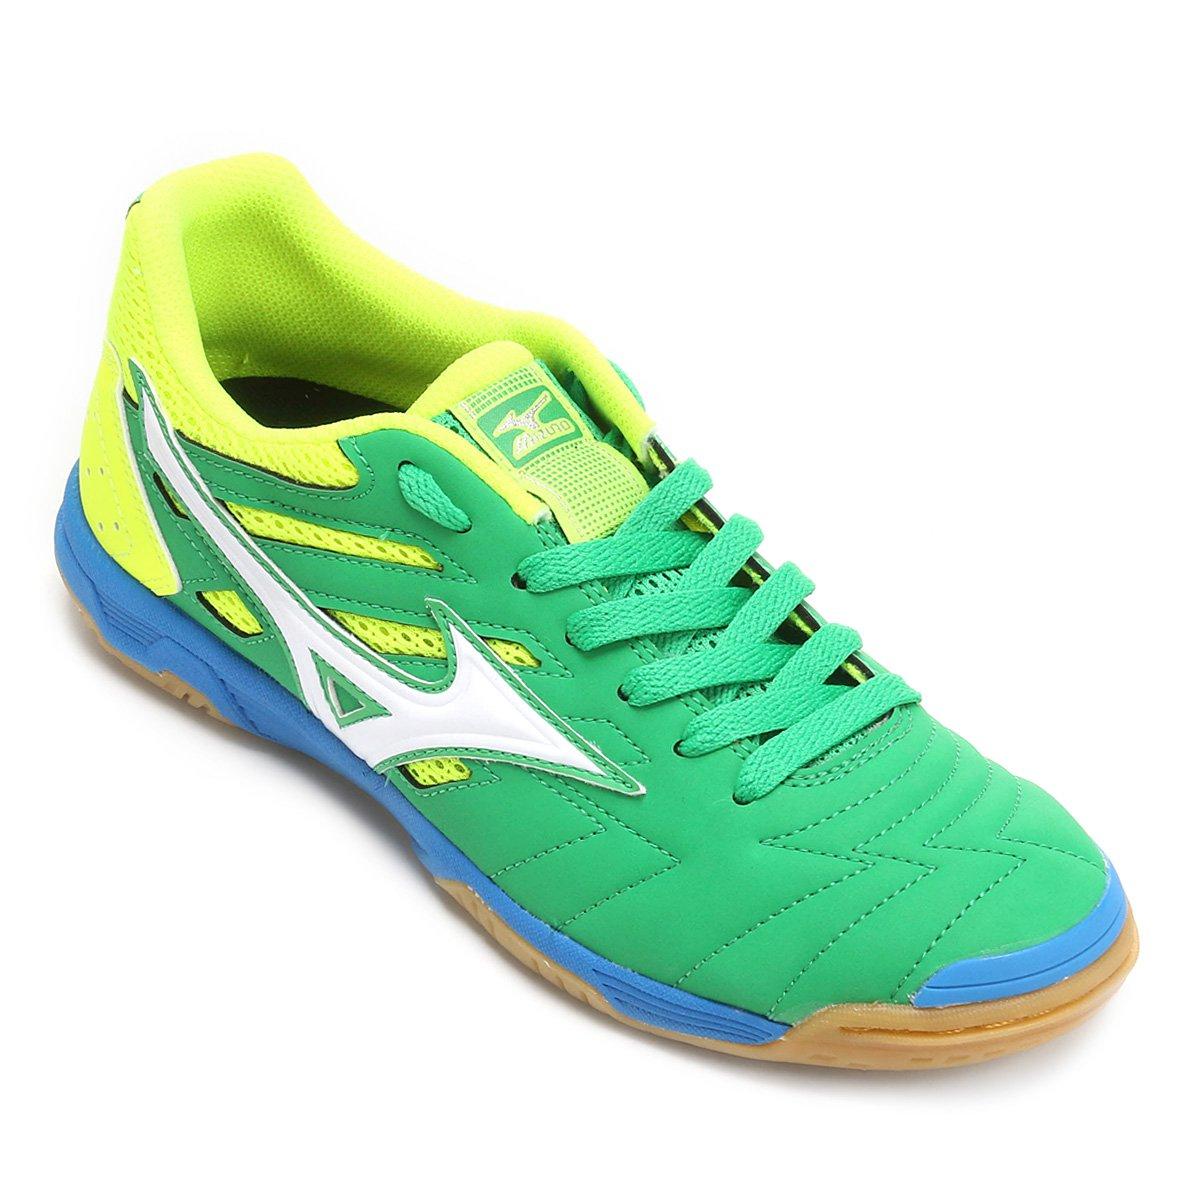 89dd5ef2f35c4 Chuteira Futsal Mizuno Sala Classic 2 In - Verde e Amarelo - Compre Agora